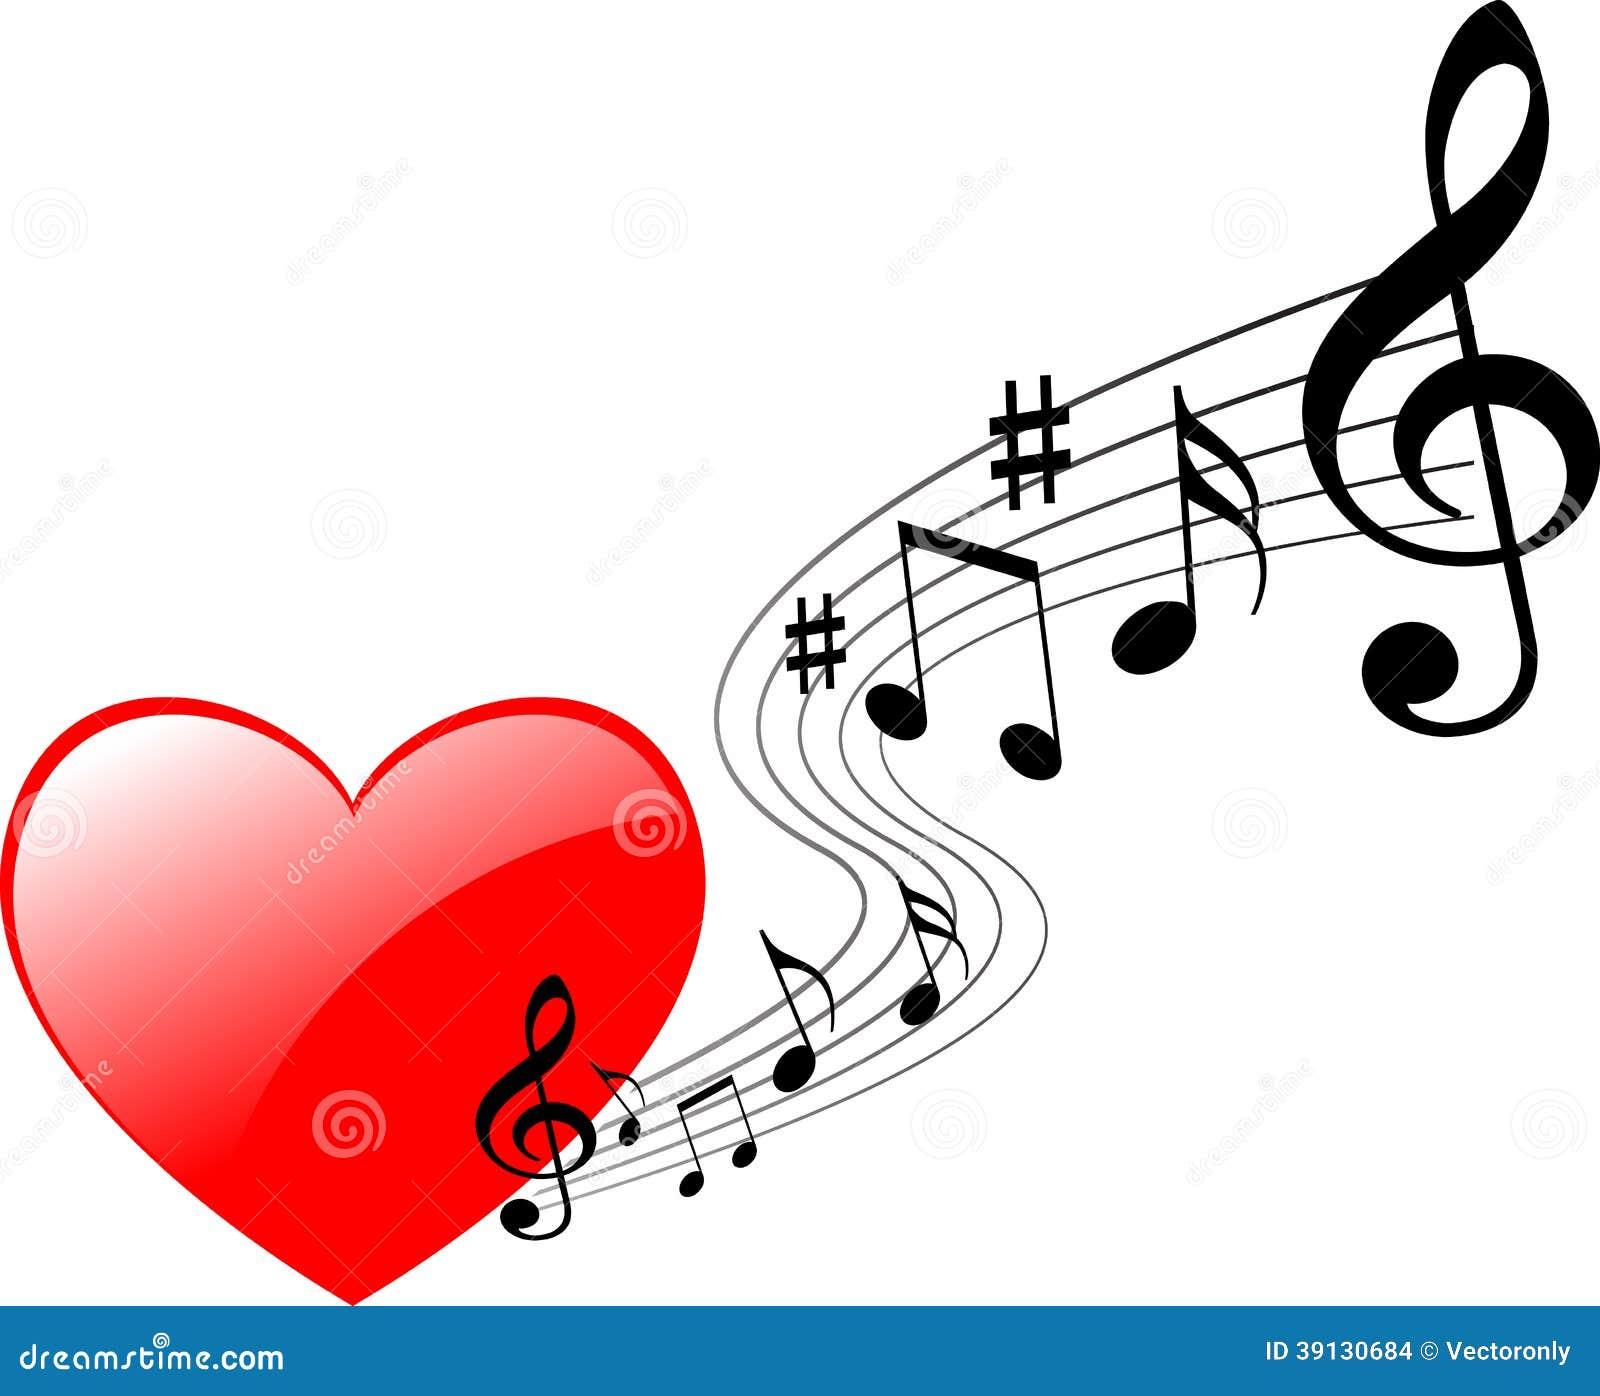 music com ve: